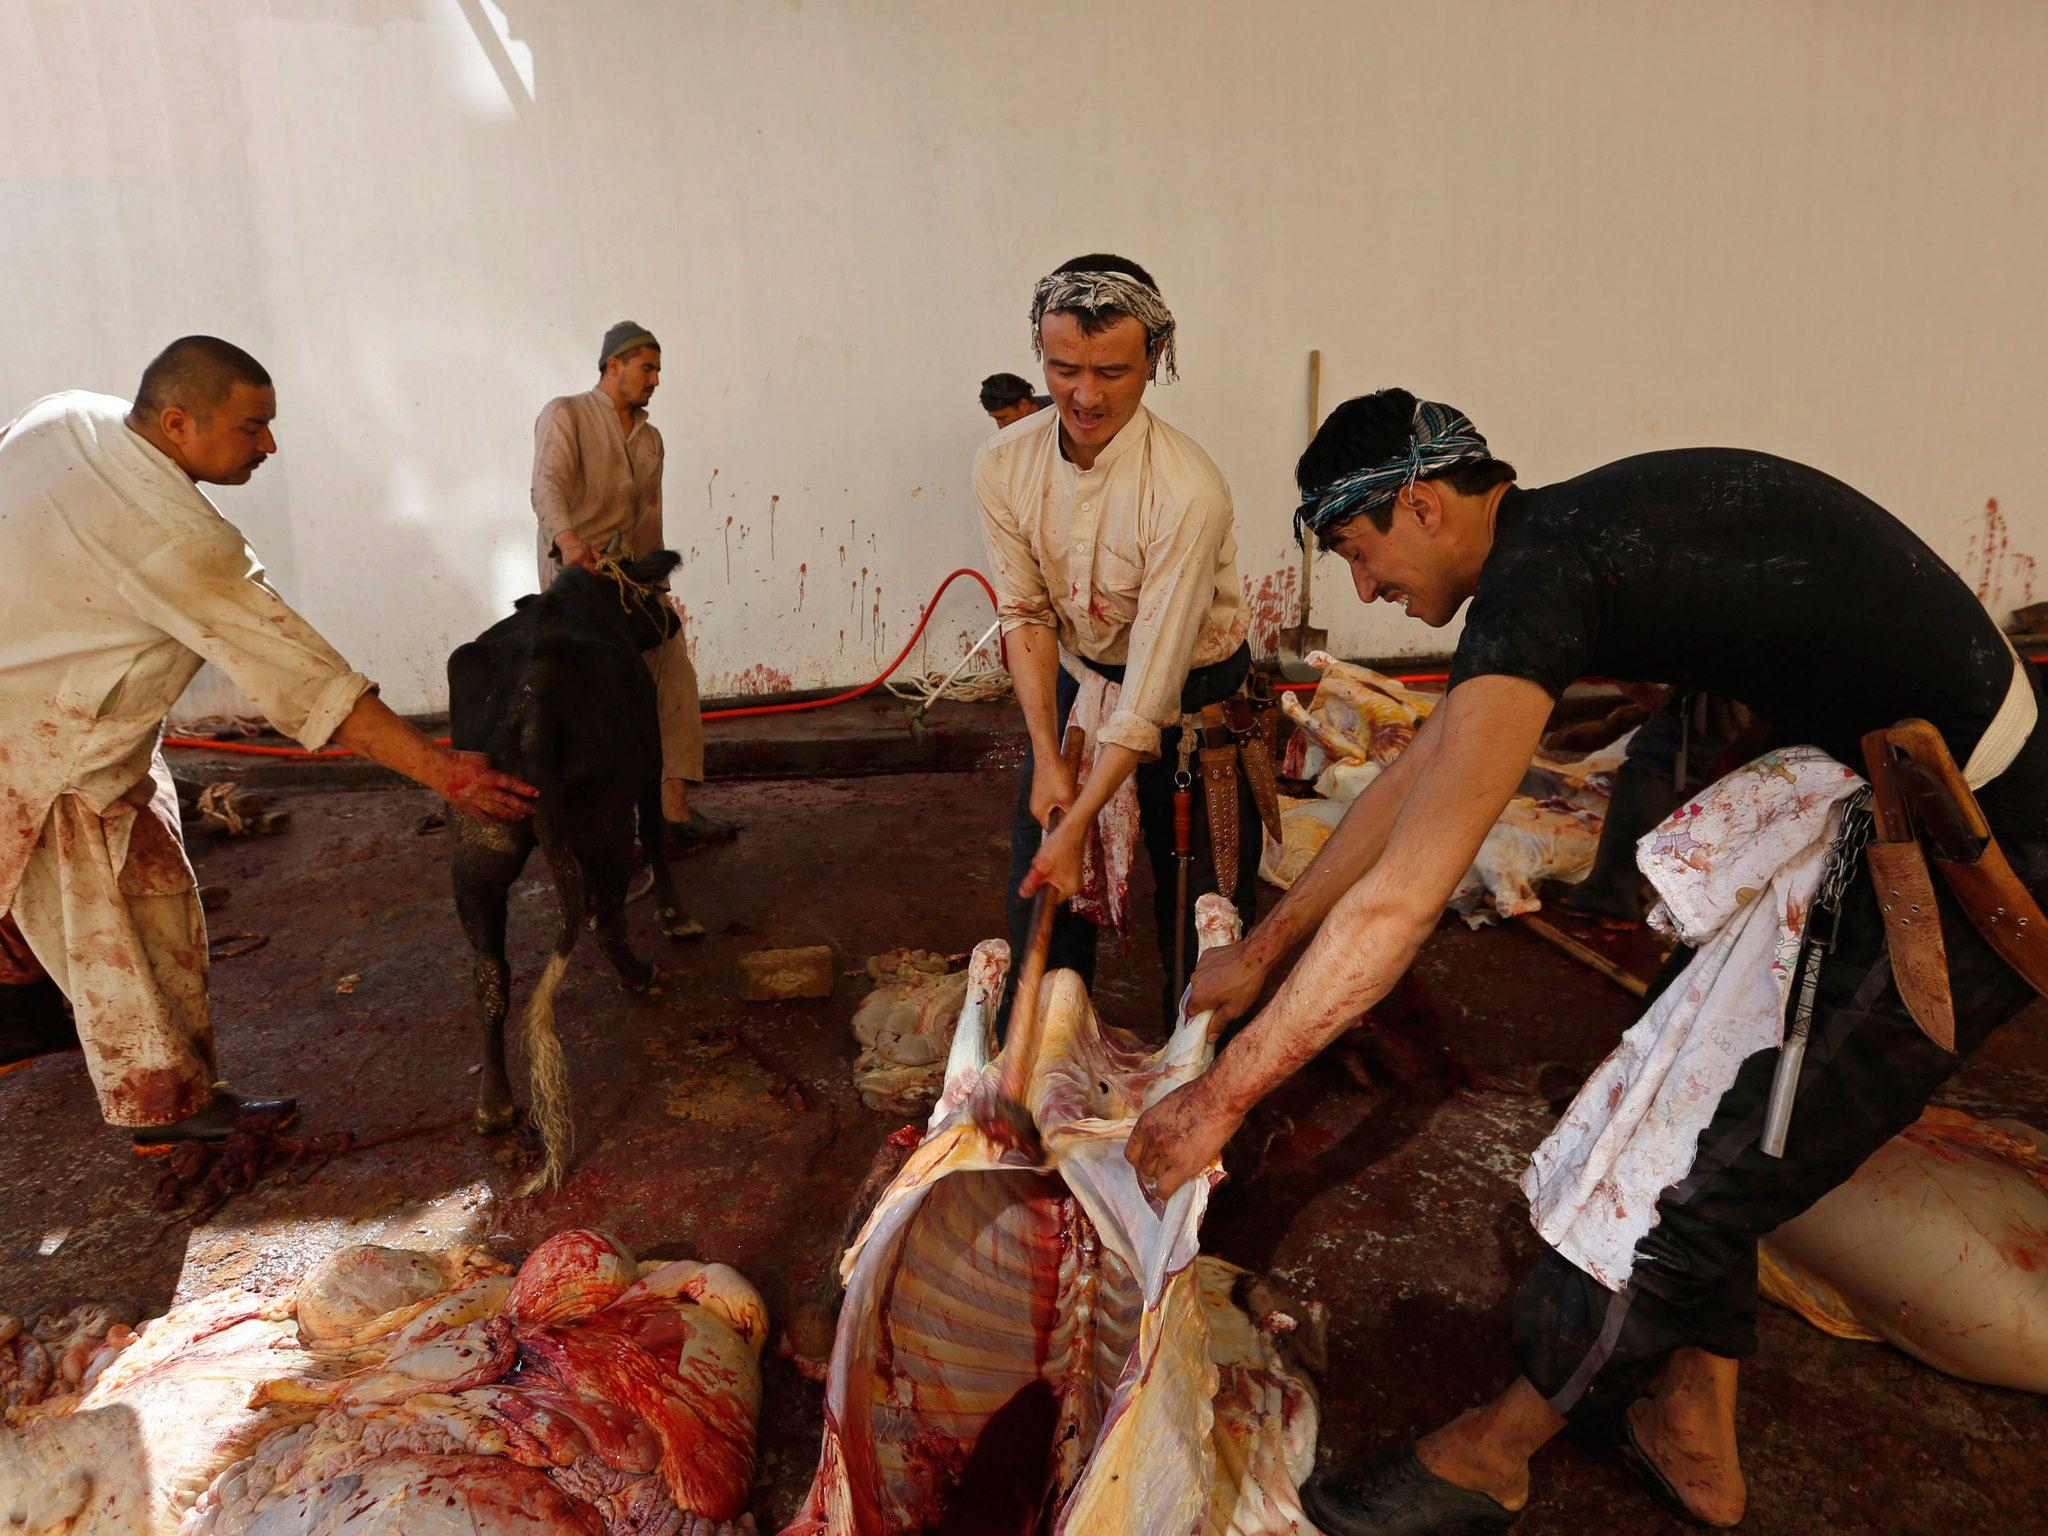 Eid Mubarak 2014: What is Eid al-Adha and why is sacrifice